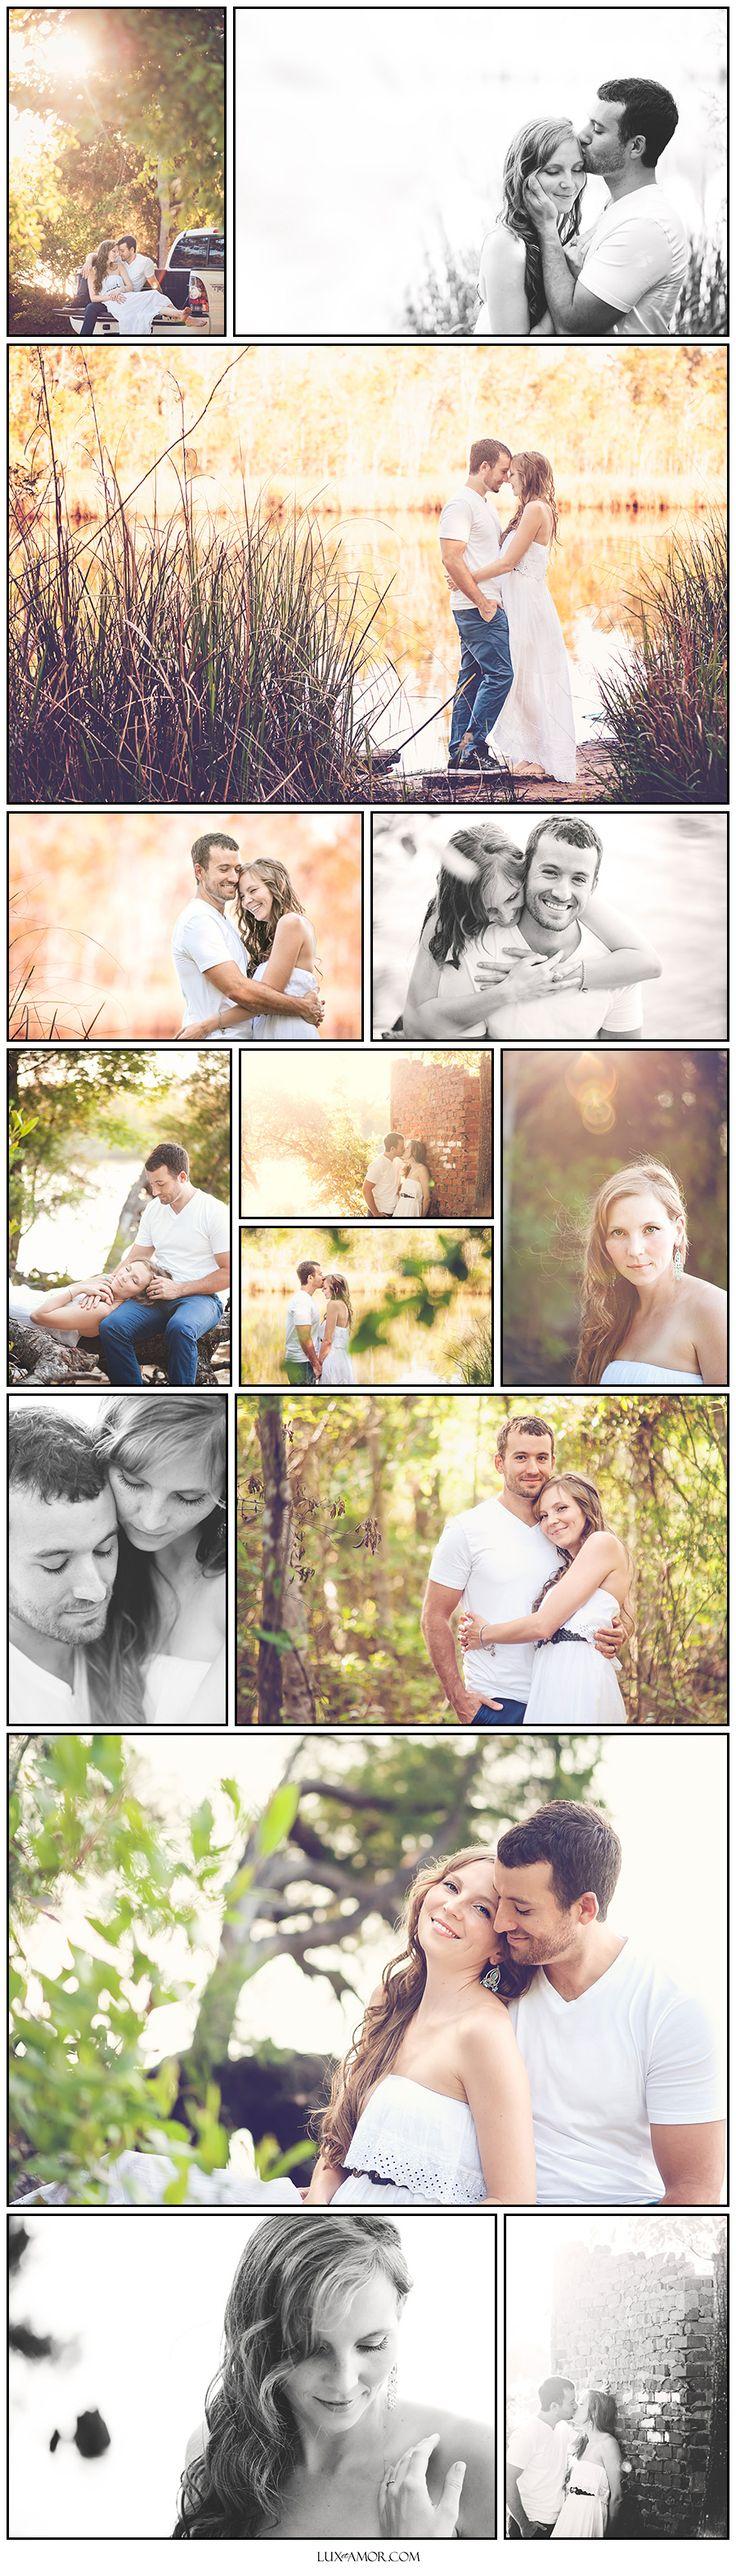 Lifestyle Photography Pensacola, Family Photography Pensacola, Portrait Photographer Pensacola,